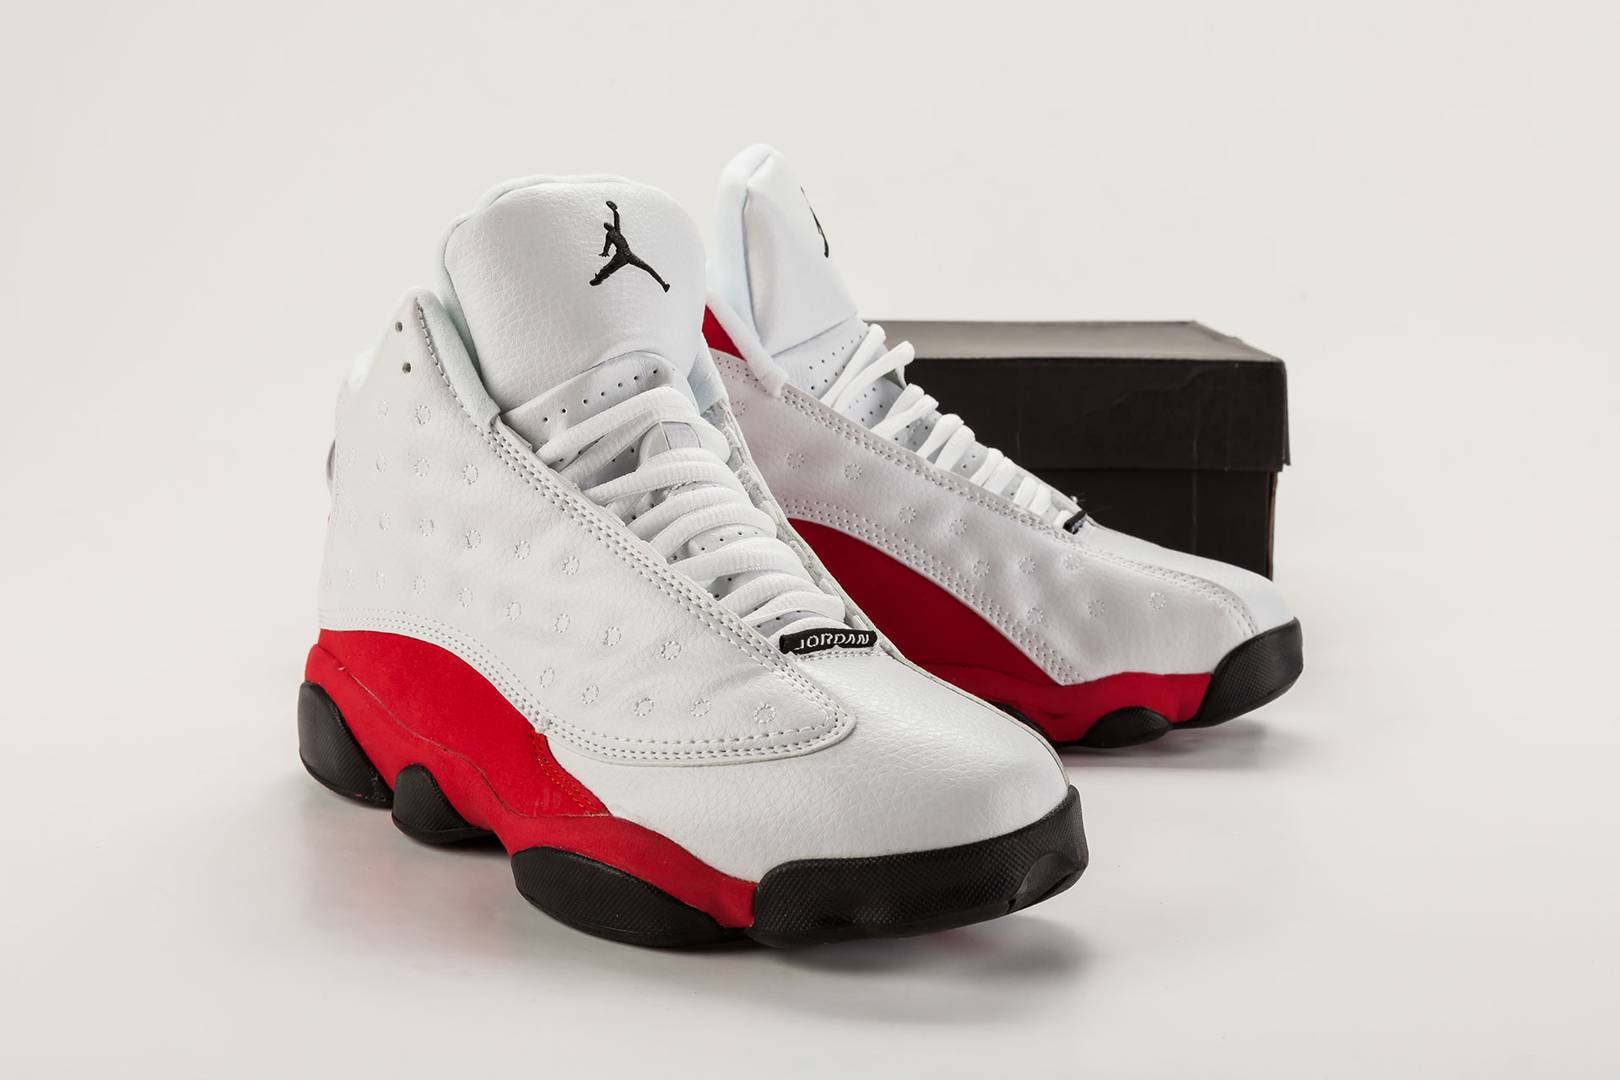 9efa89dbc64531 Counterfeit Nike Air Jordans Ring Worth  73 million Shut Down ...